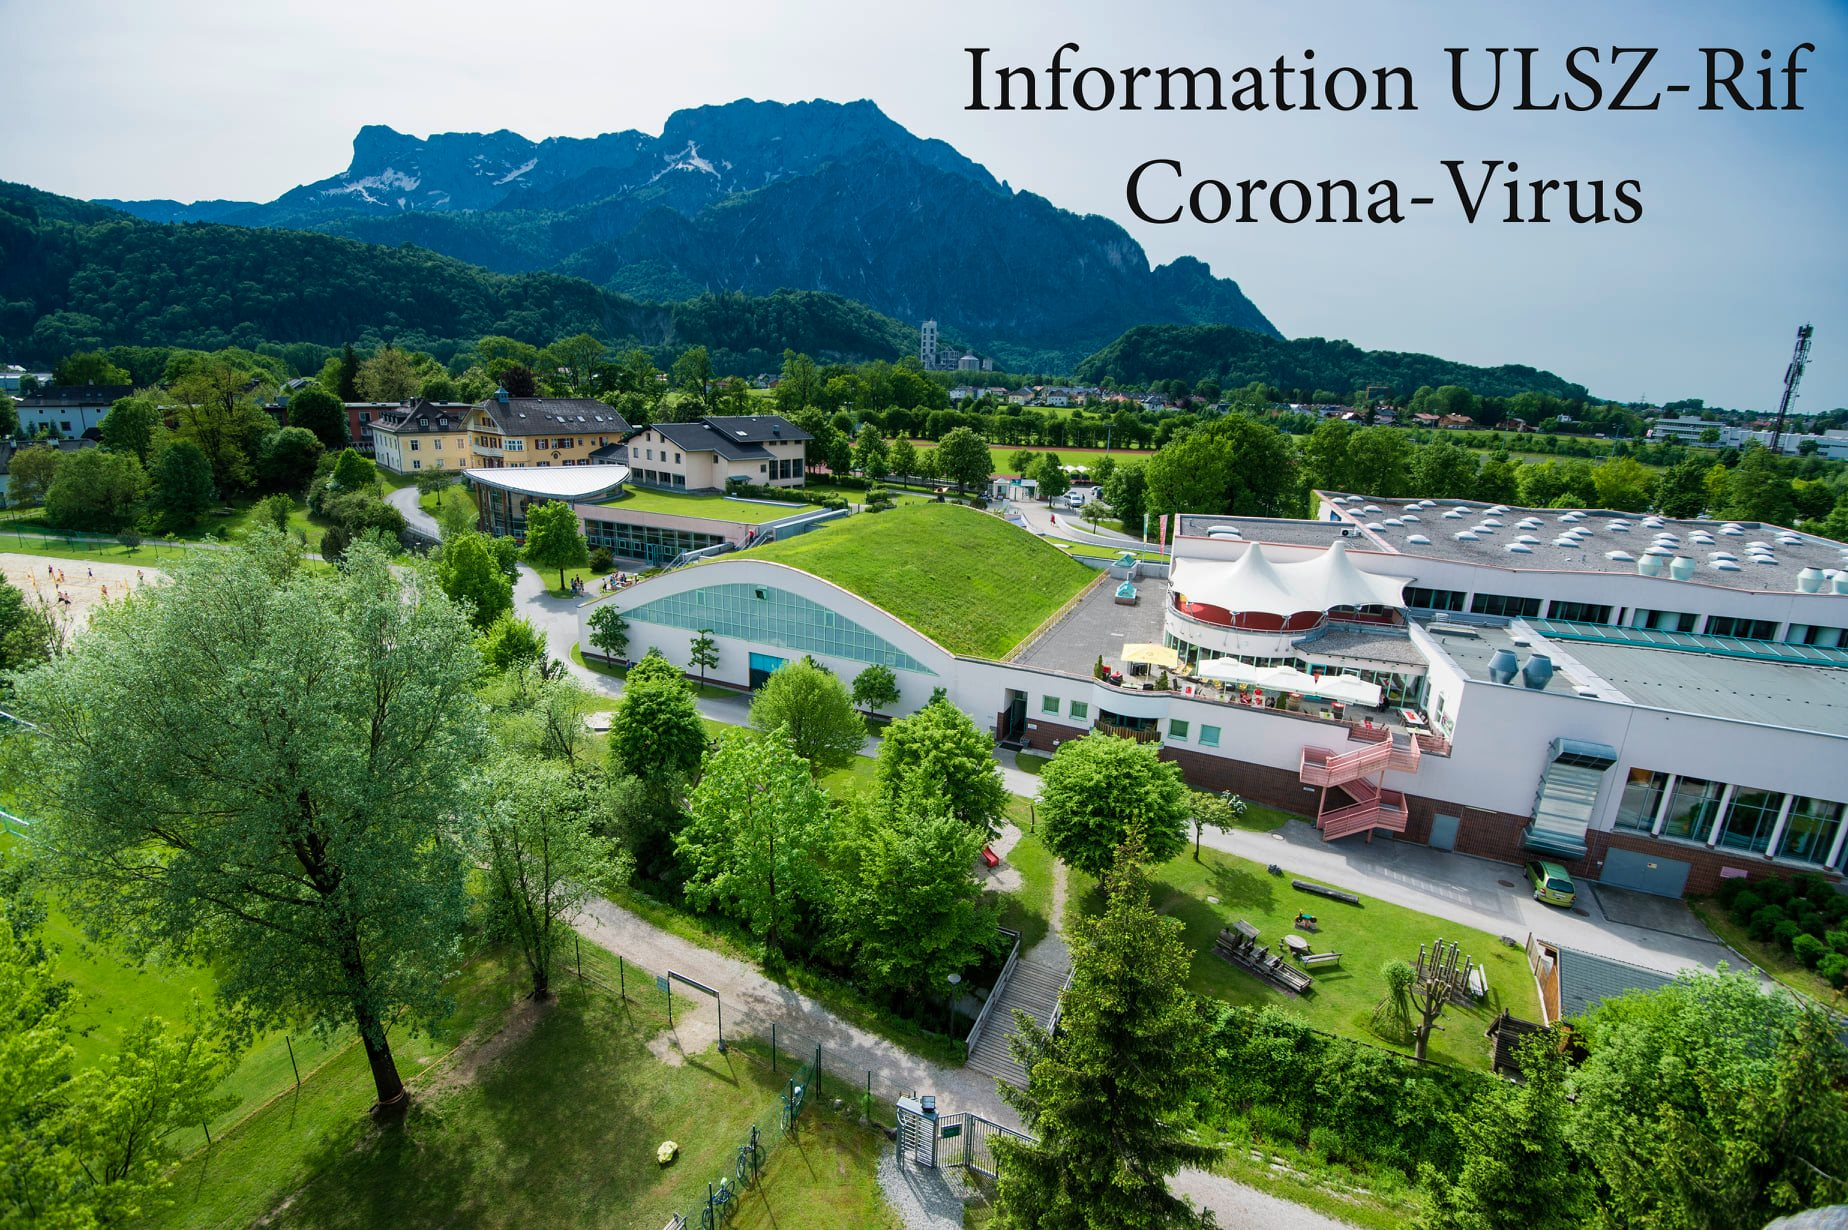 Information ULSZ-Rif - Corona Virus